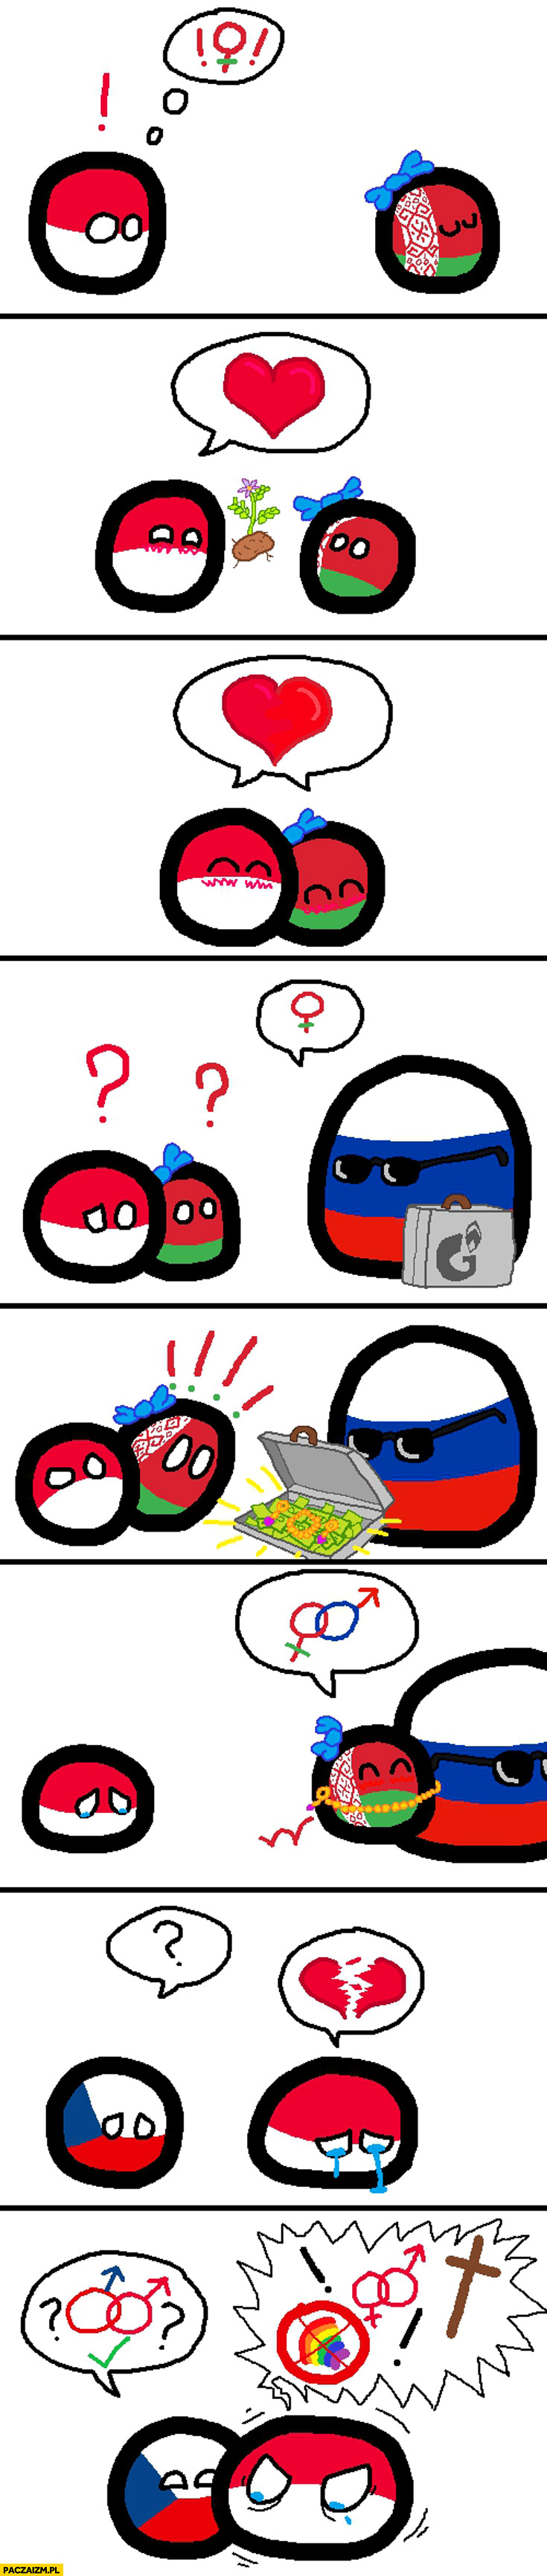 Polandball Polska Białoruś Rosja Czechy